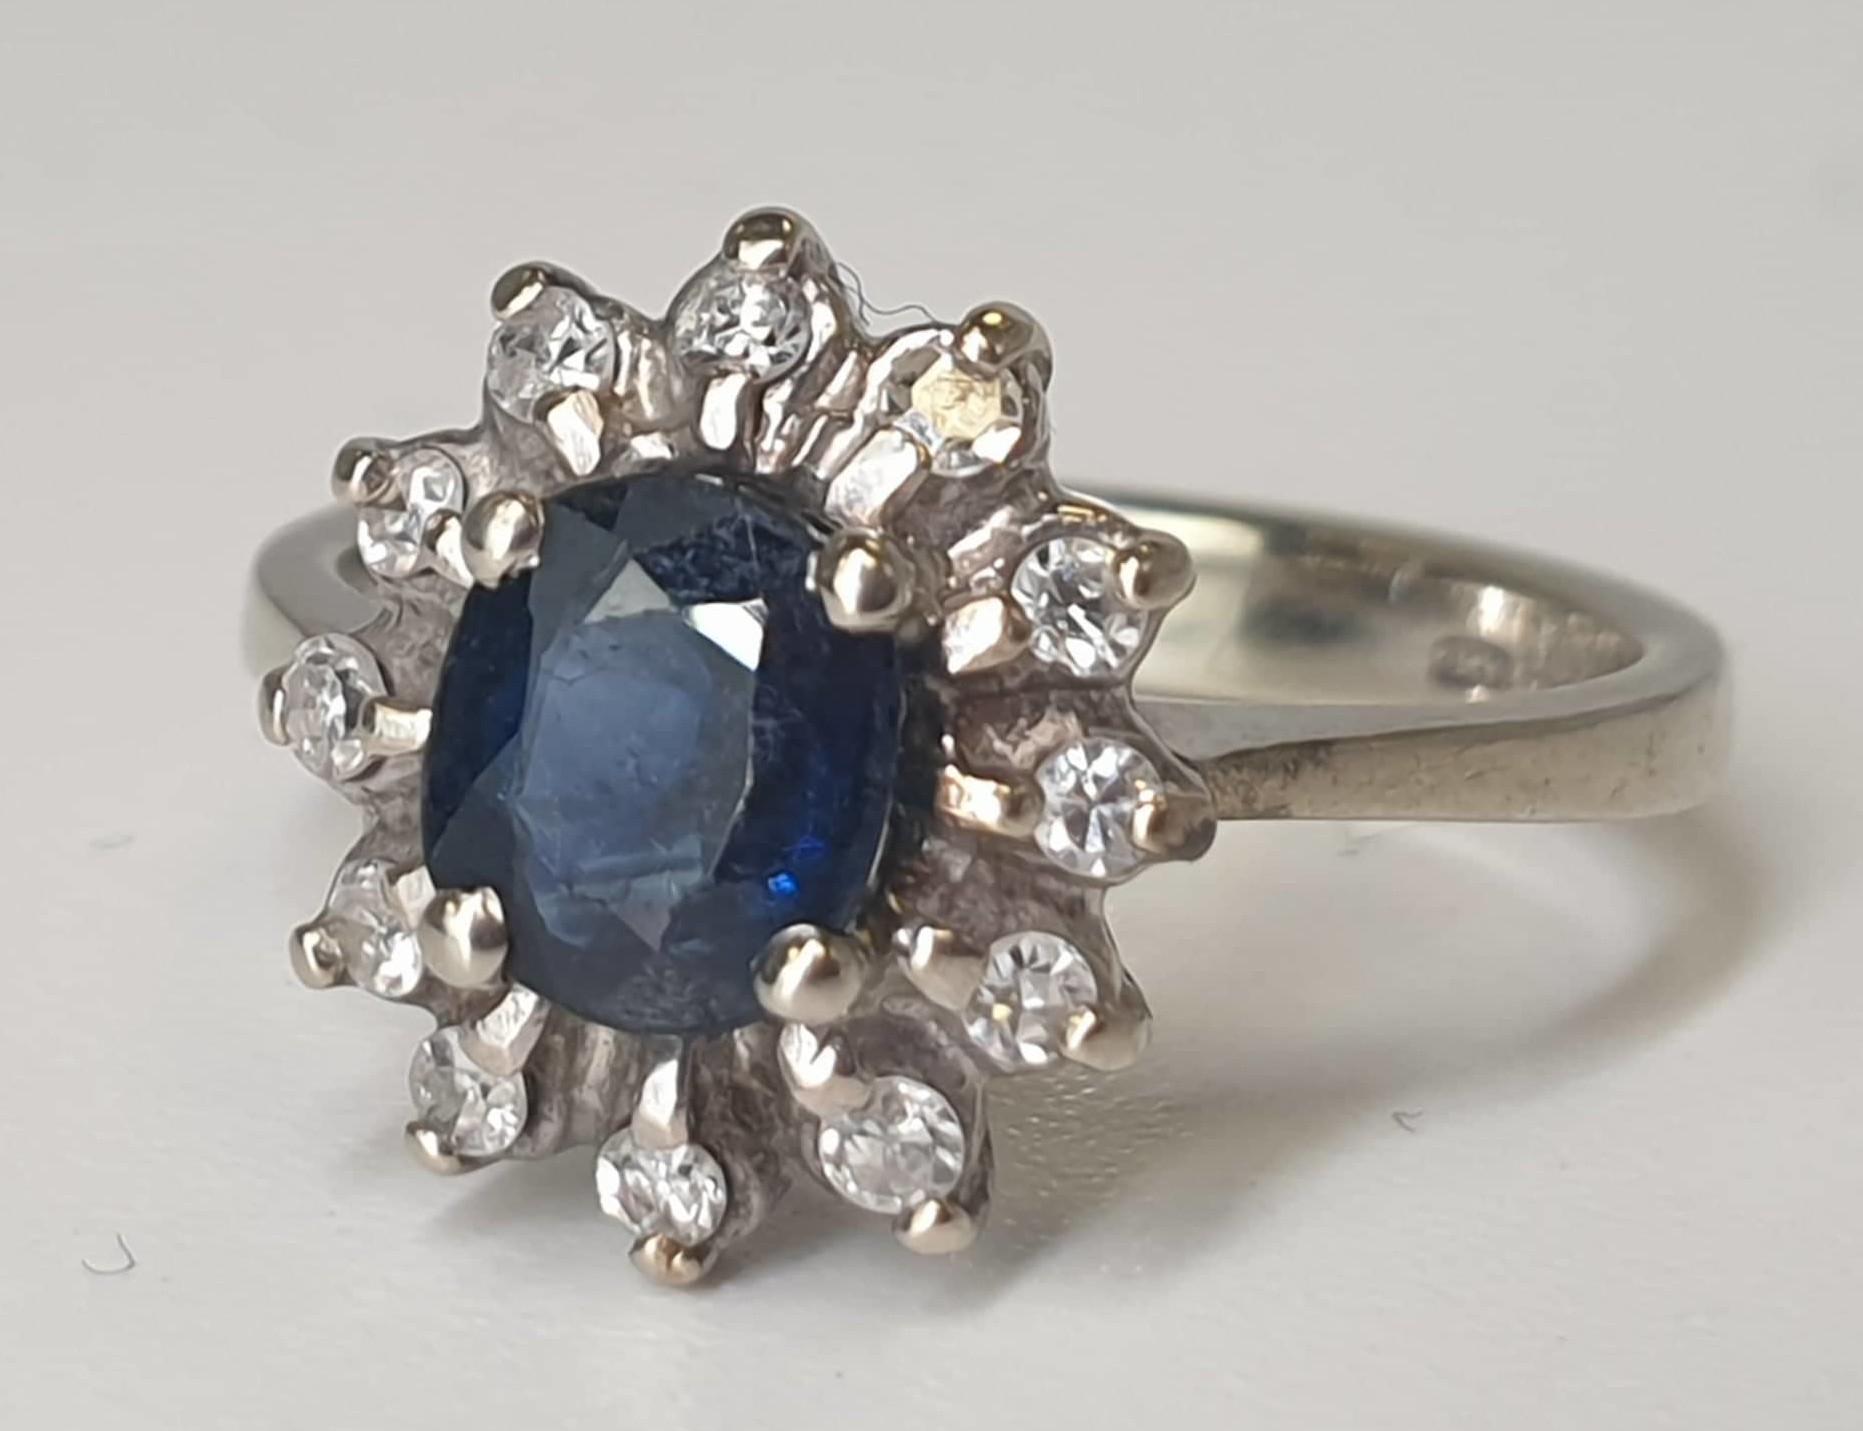 Diamond & Sapphire Ring | 14K White Gold - Image 2 of 5